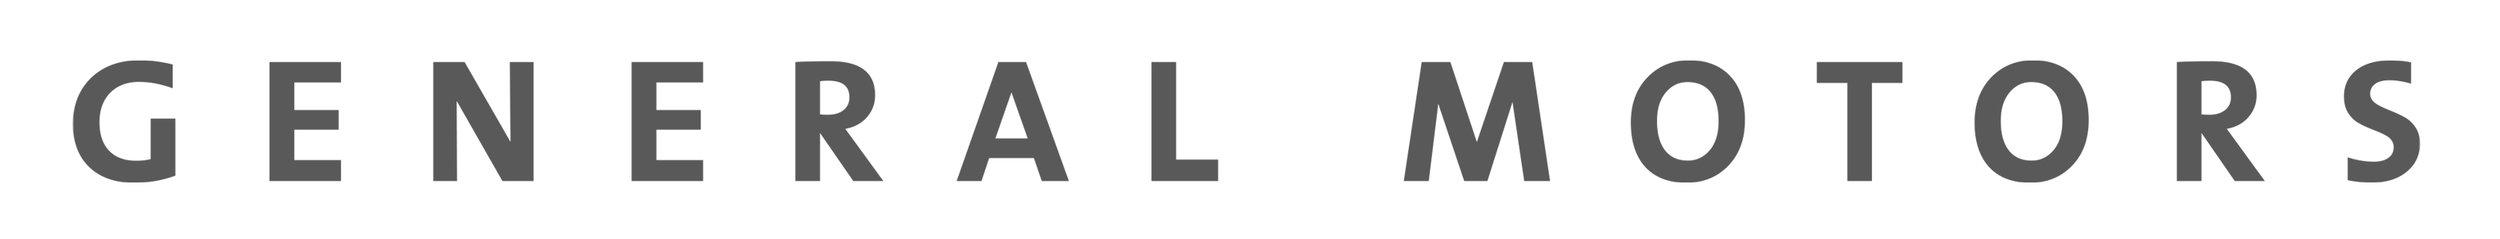 General-Motors-Signature (1).jpg